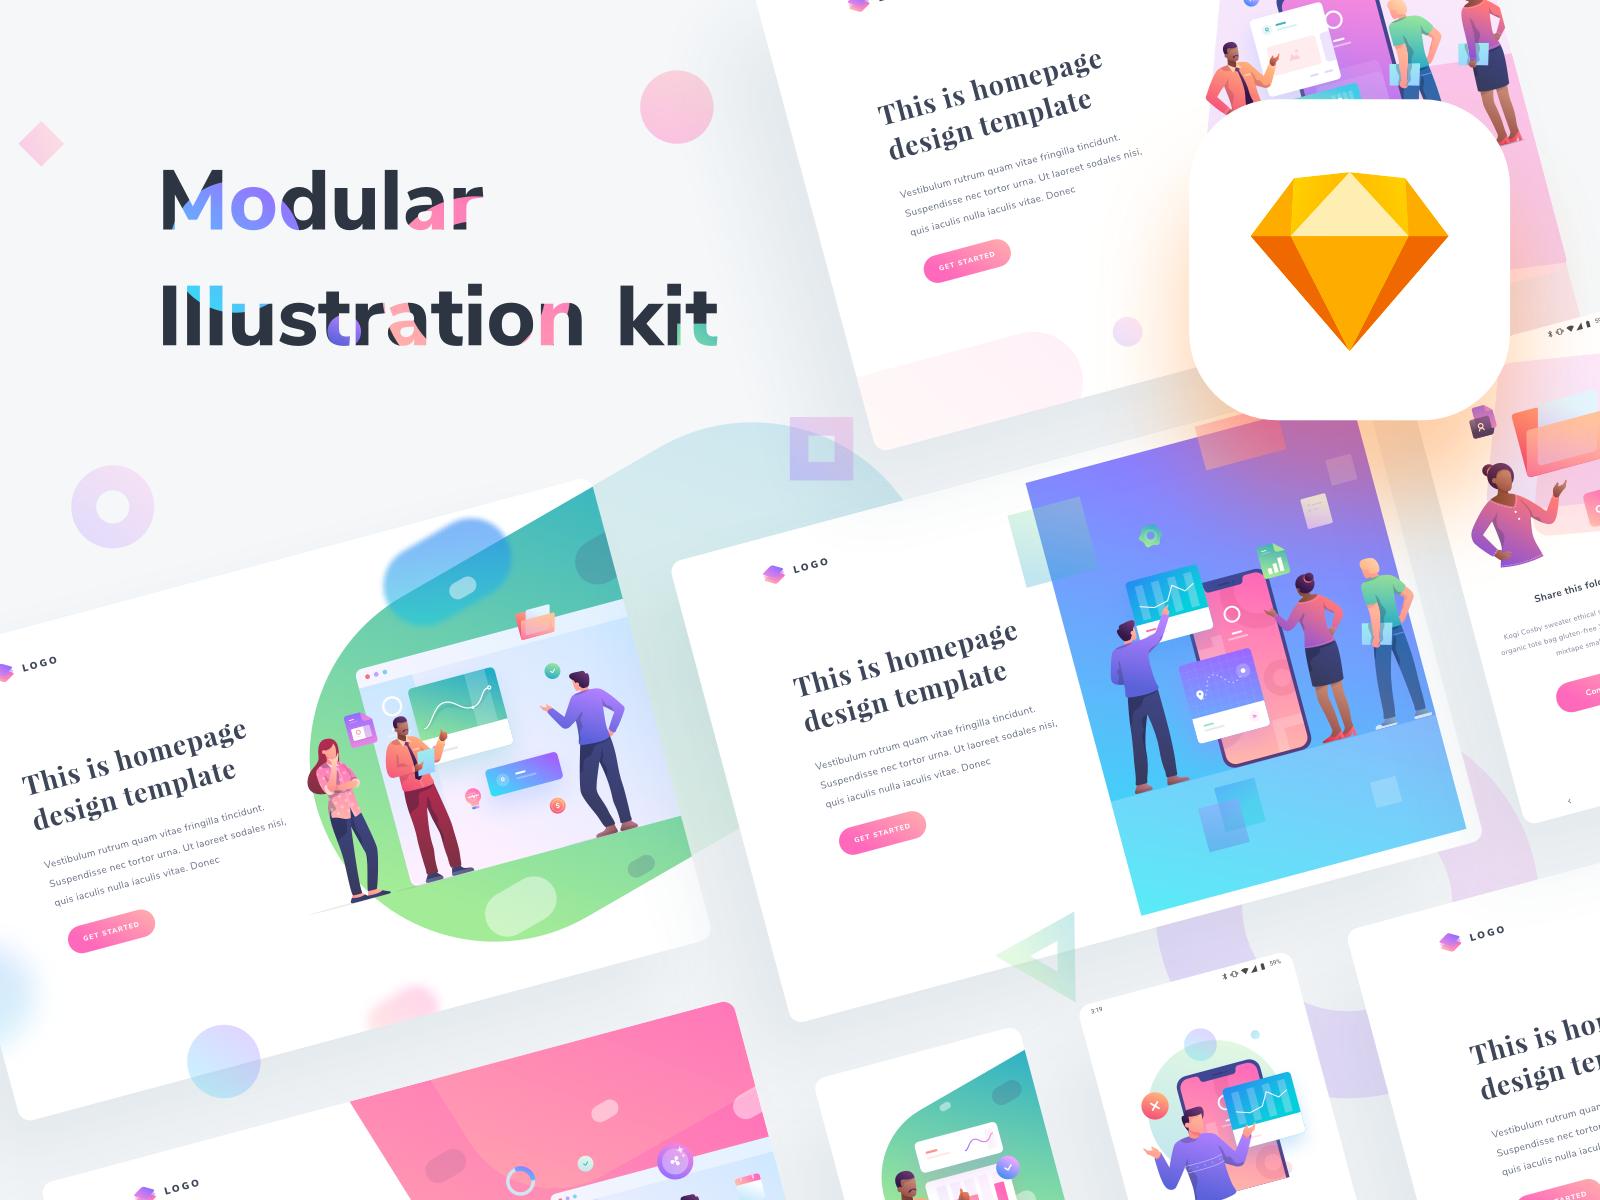 Modular Illustration Kit Illustration Graphic Design Resources Graphic Illustration